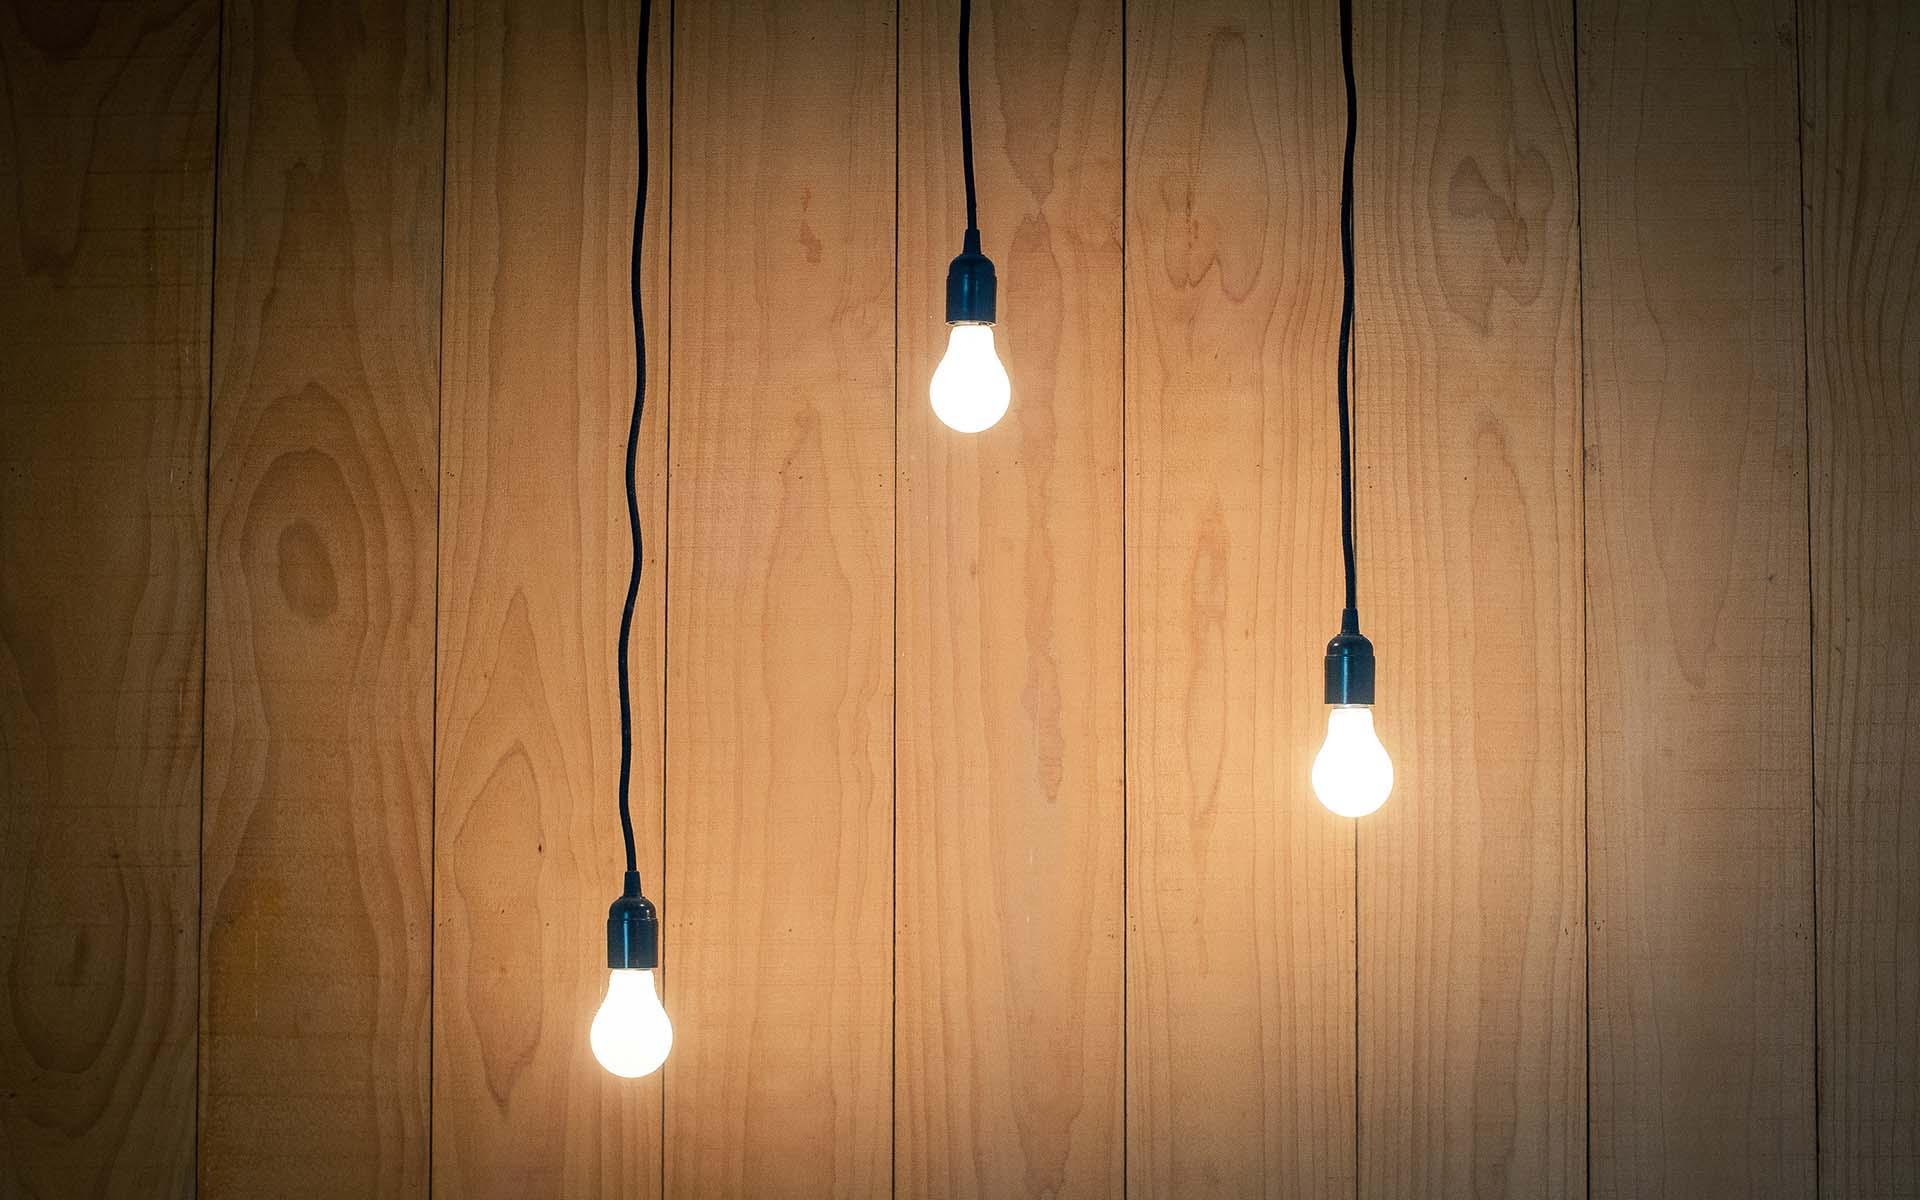 Light Bulb Hd Wallpapers Wallpaper Cave